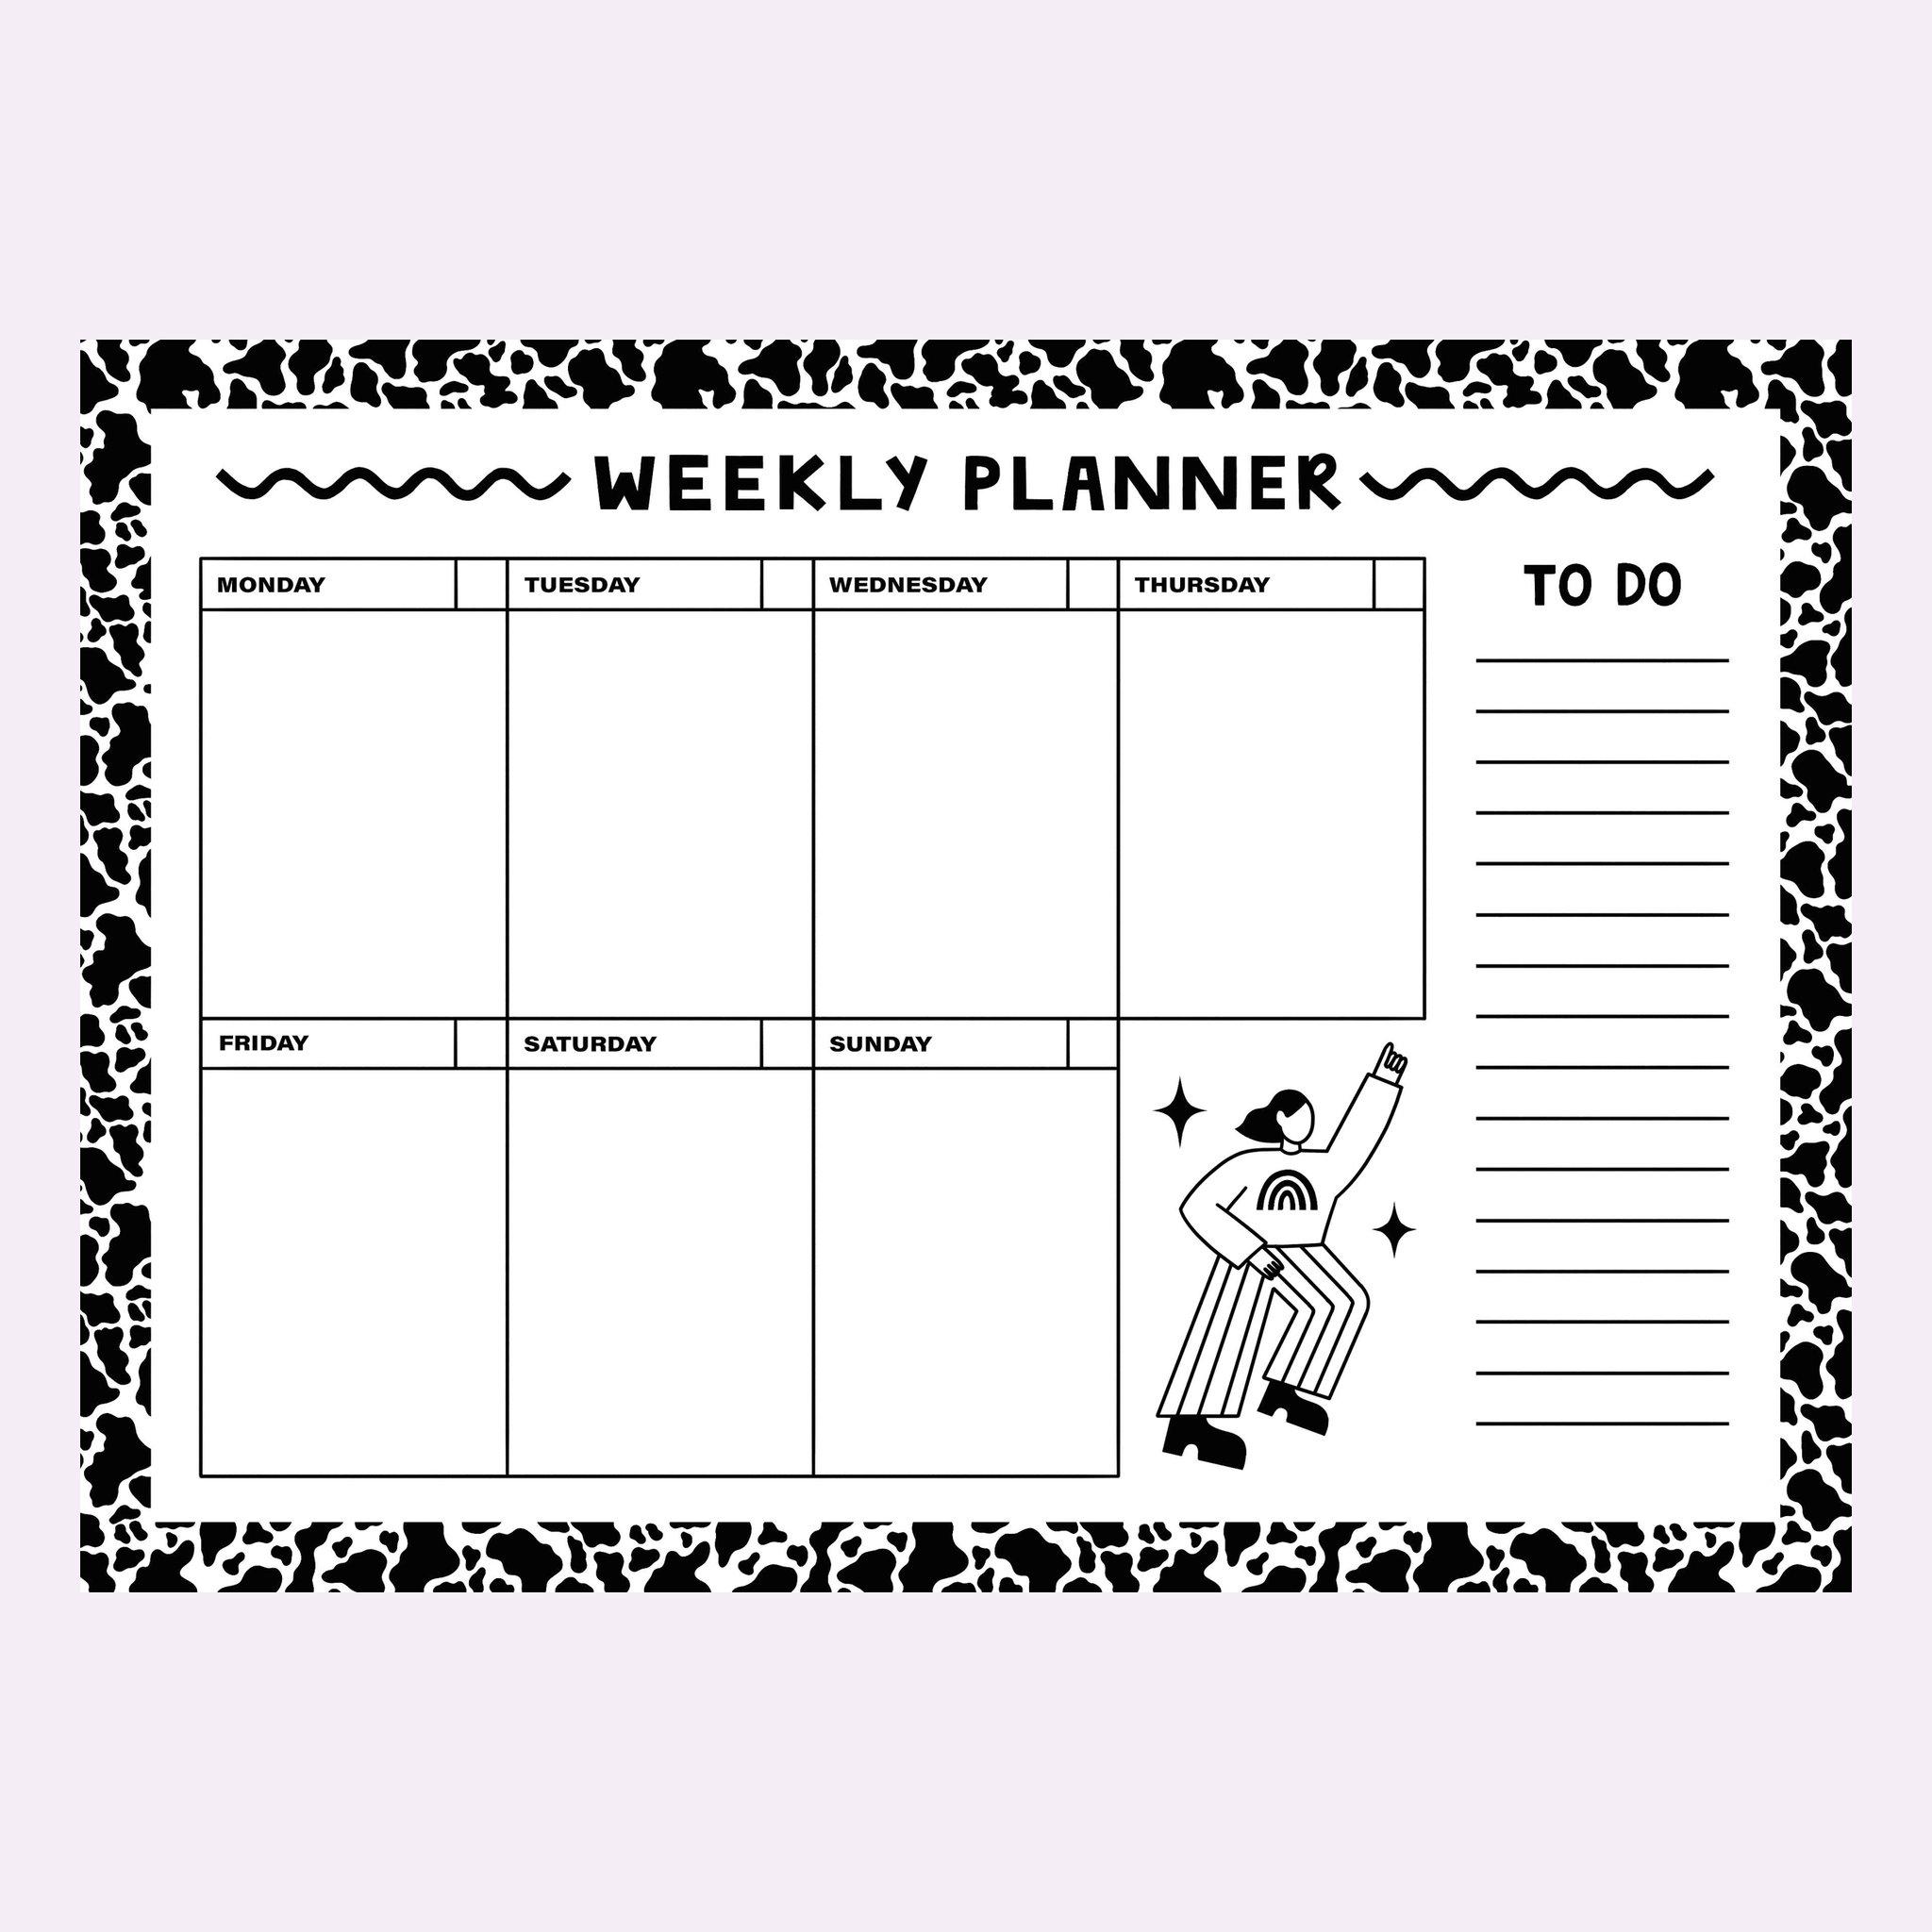 Eva Malley Illustration - Weekly Planner